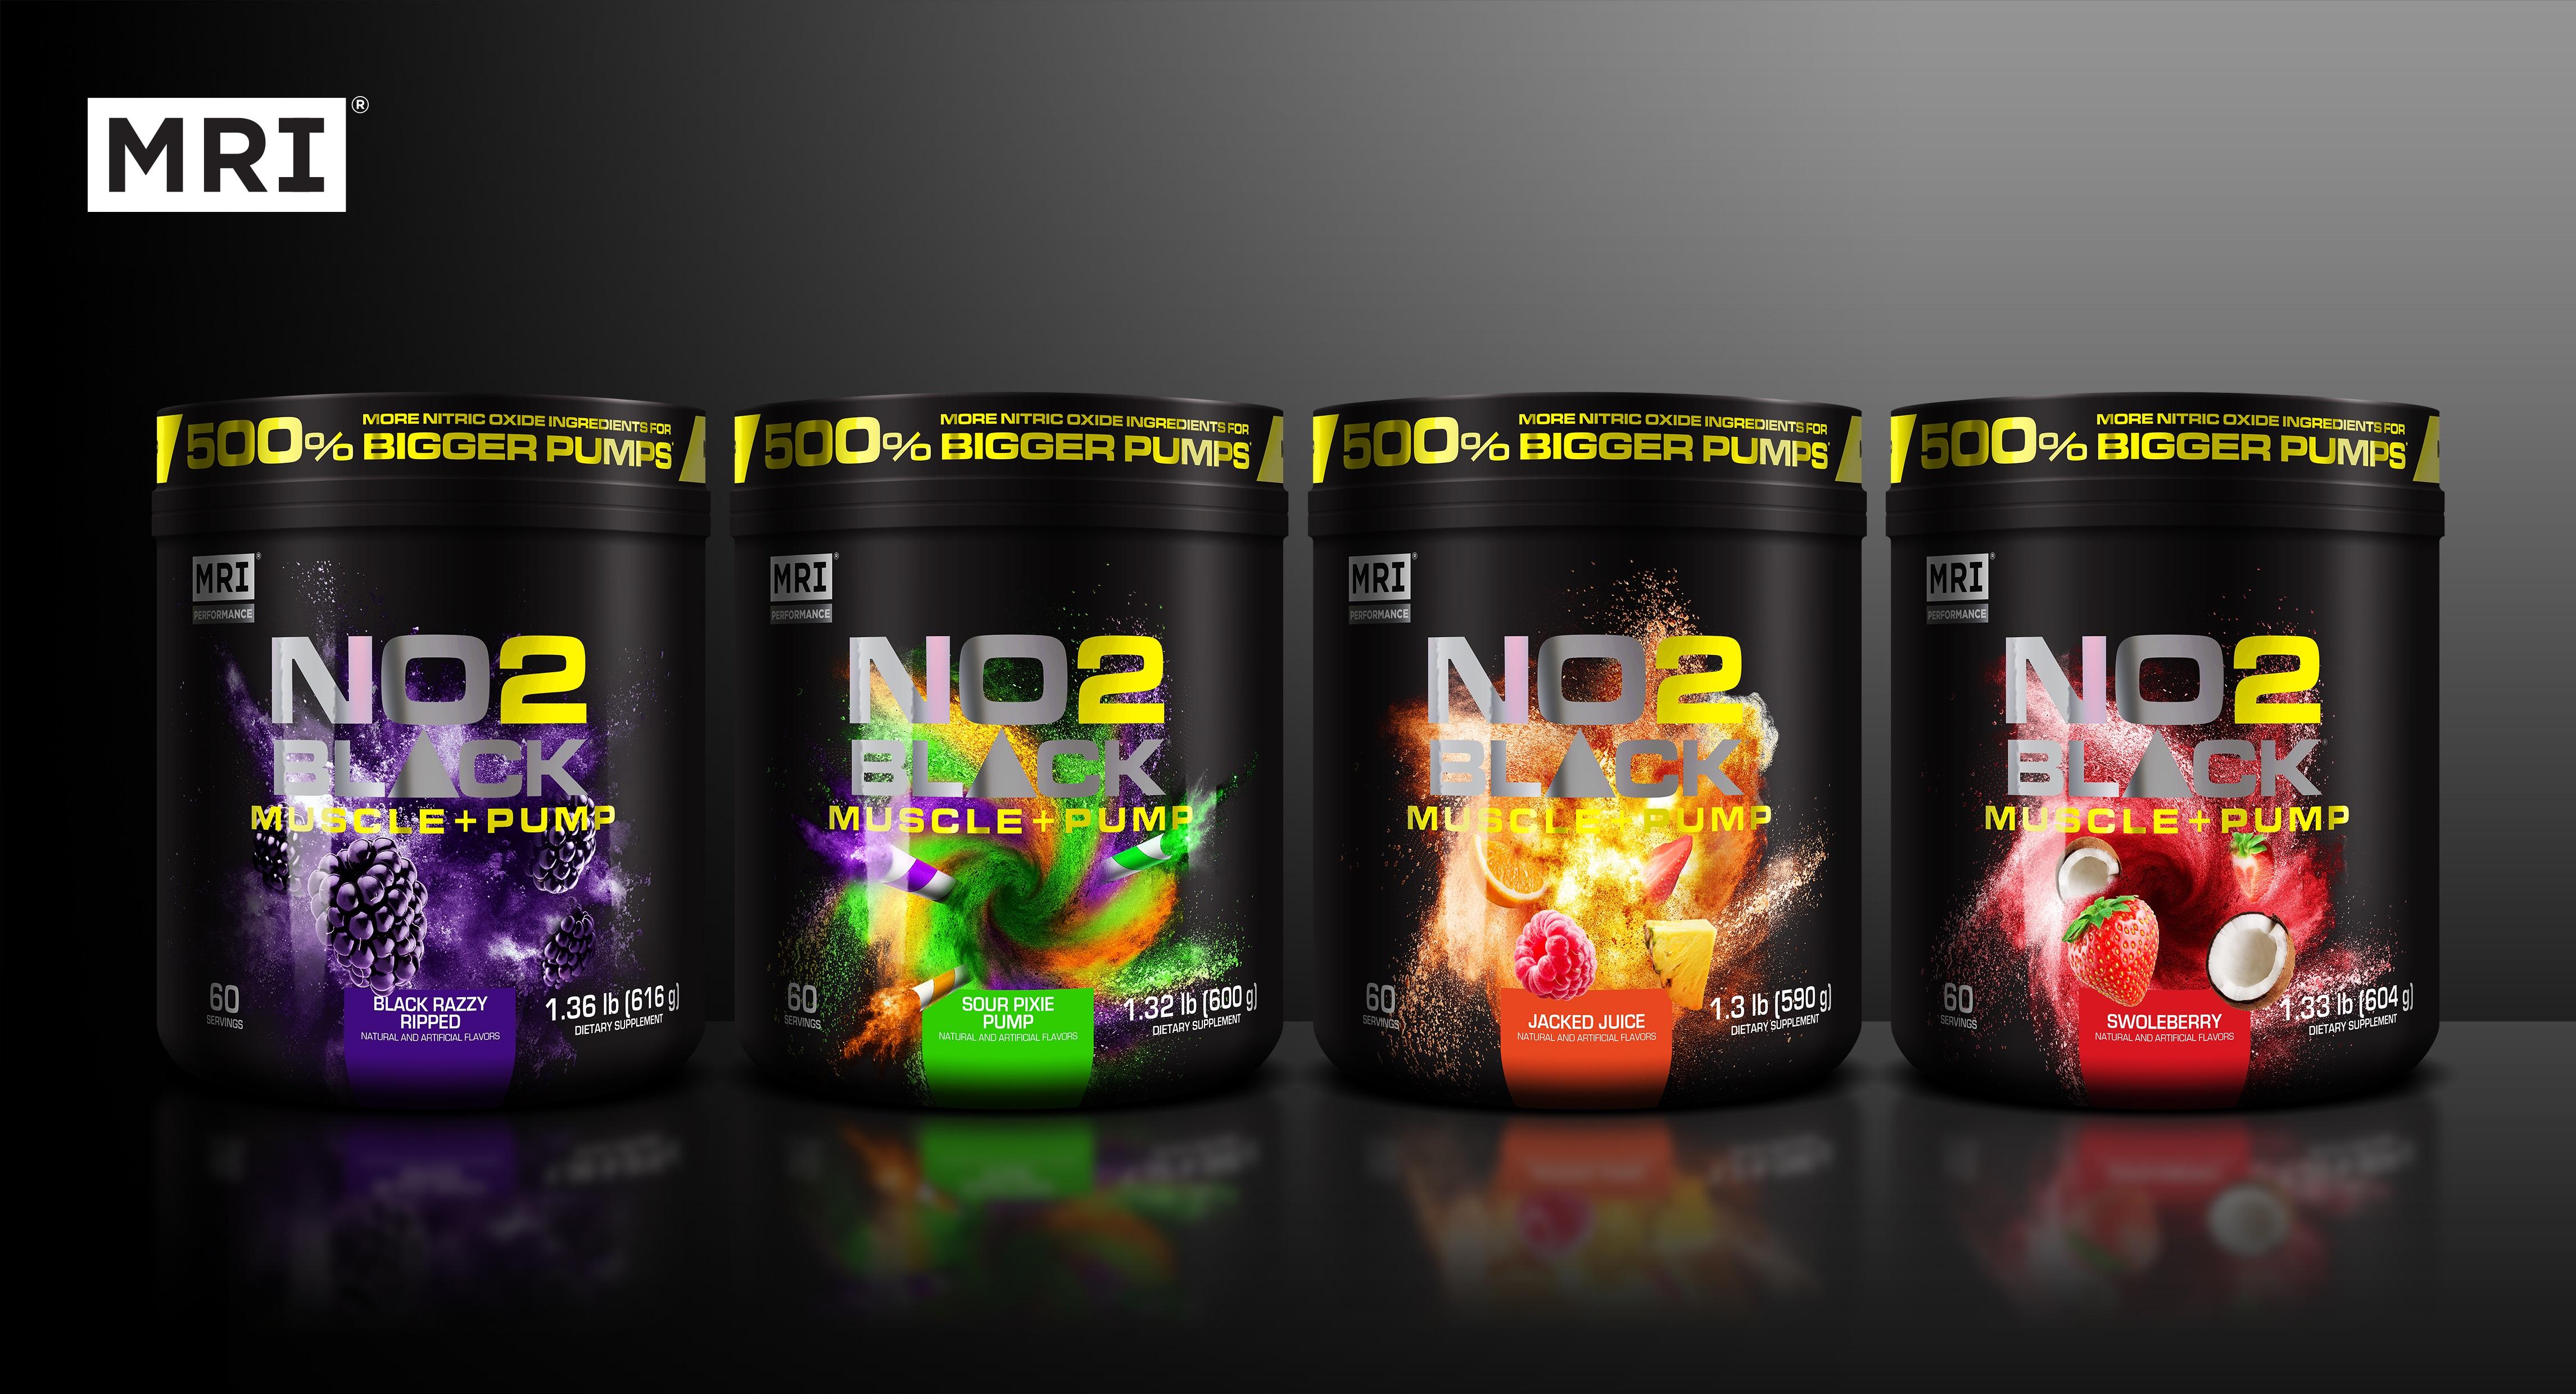 mri-performance-no2-black-flavors-banner.jpg